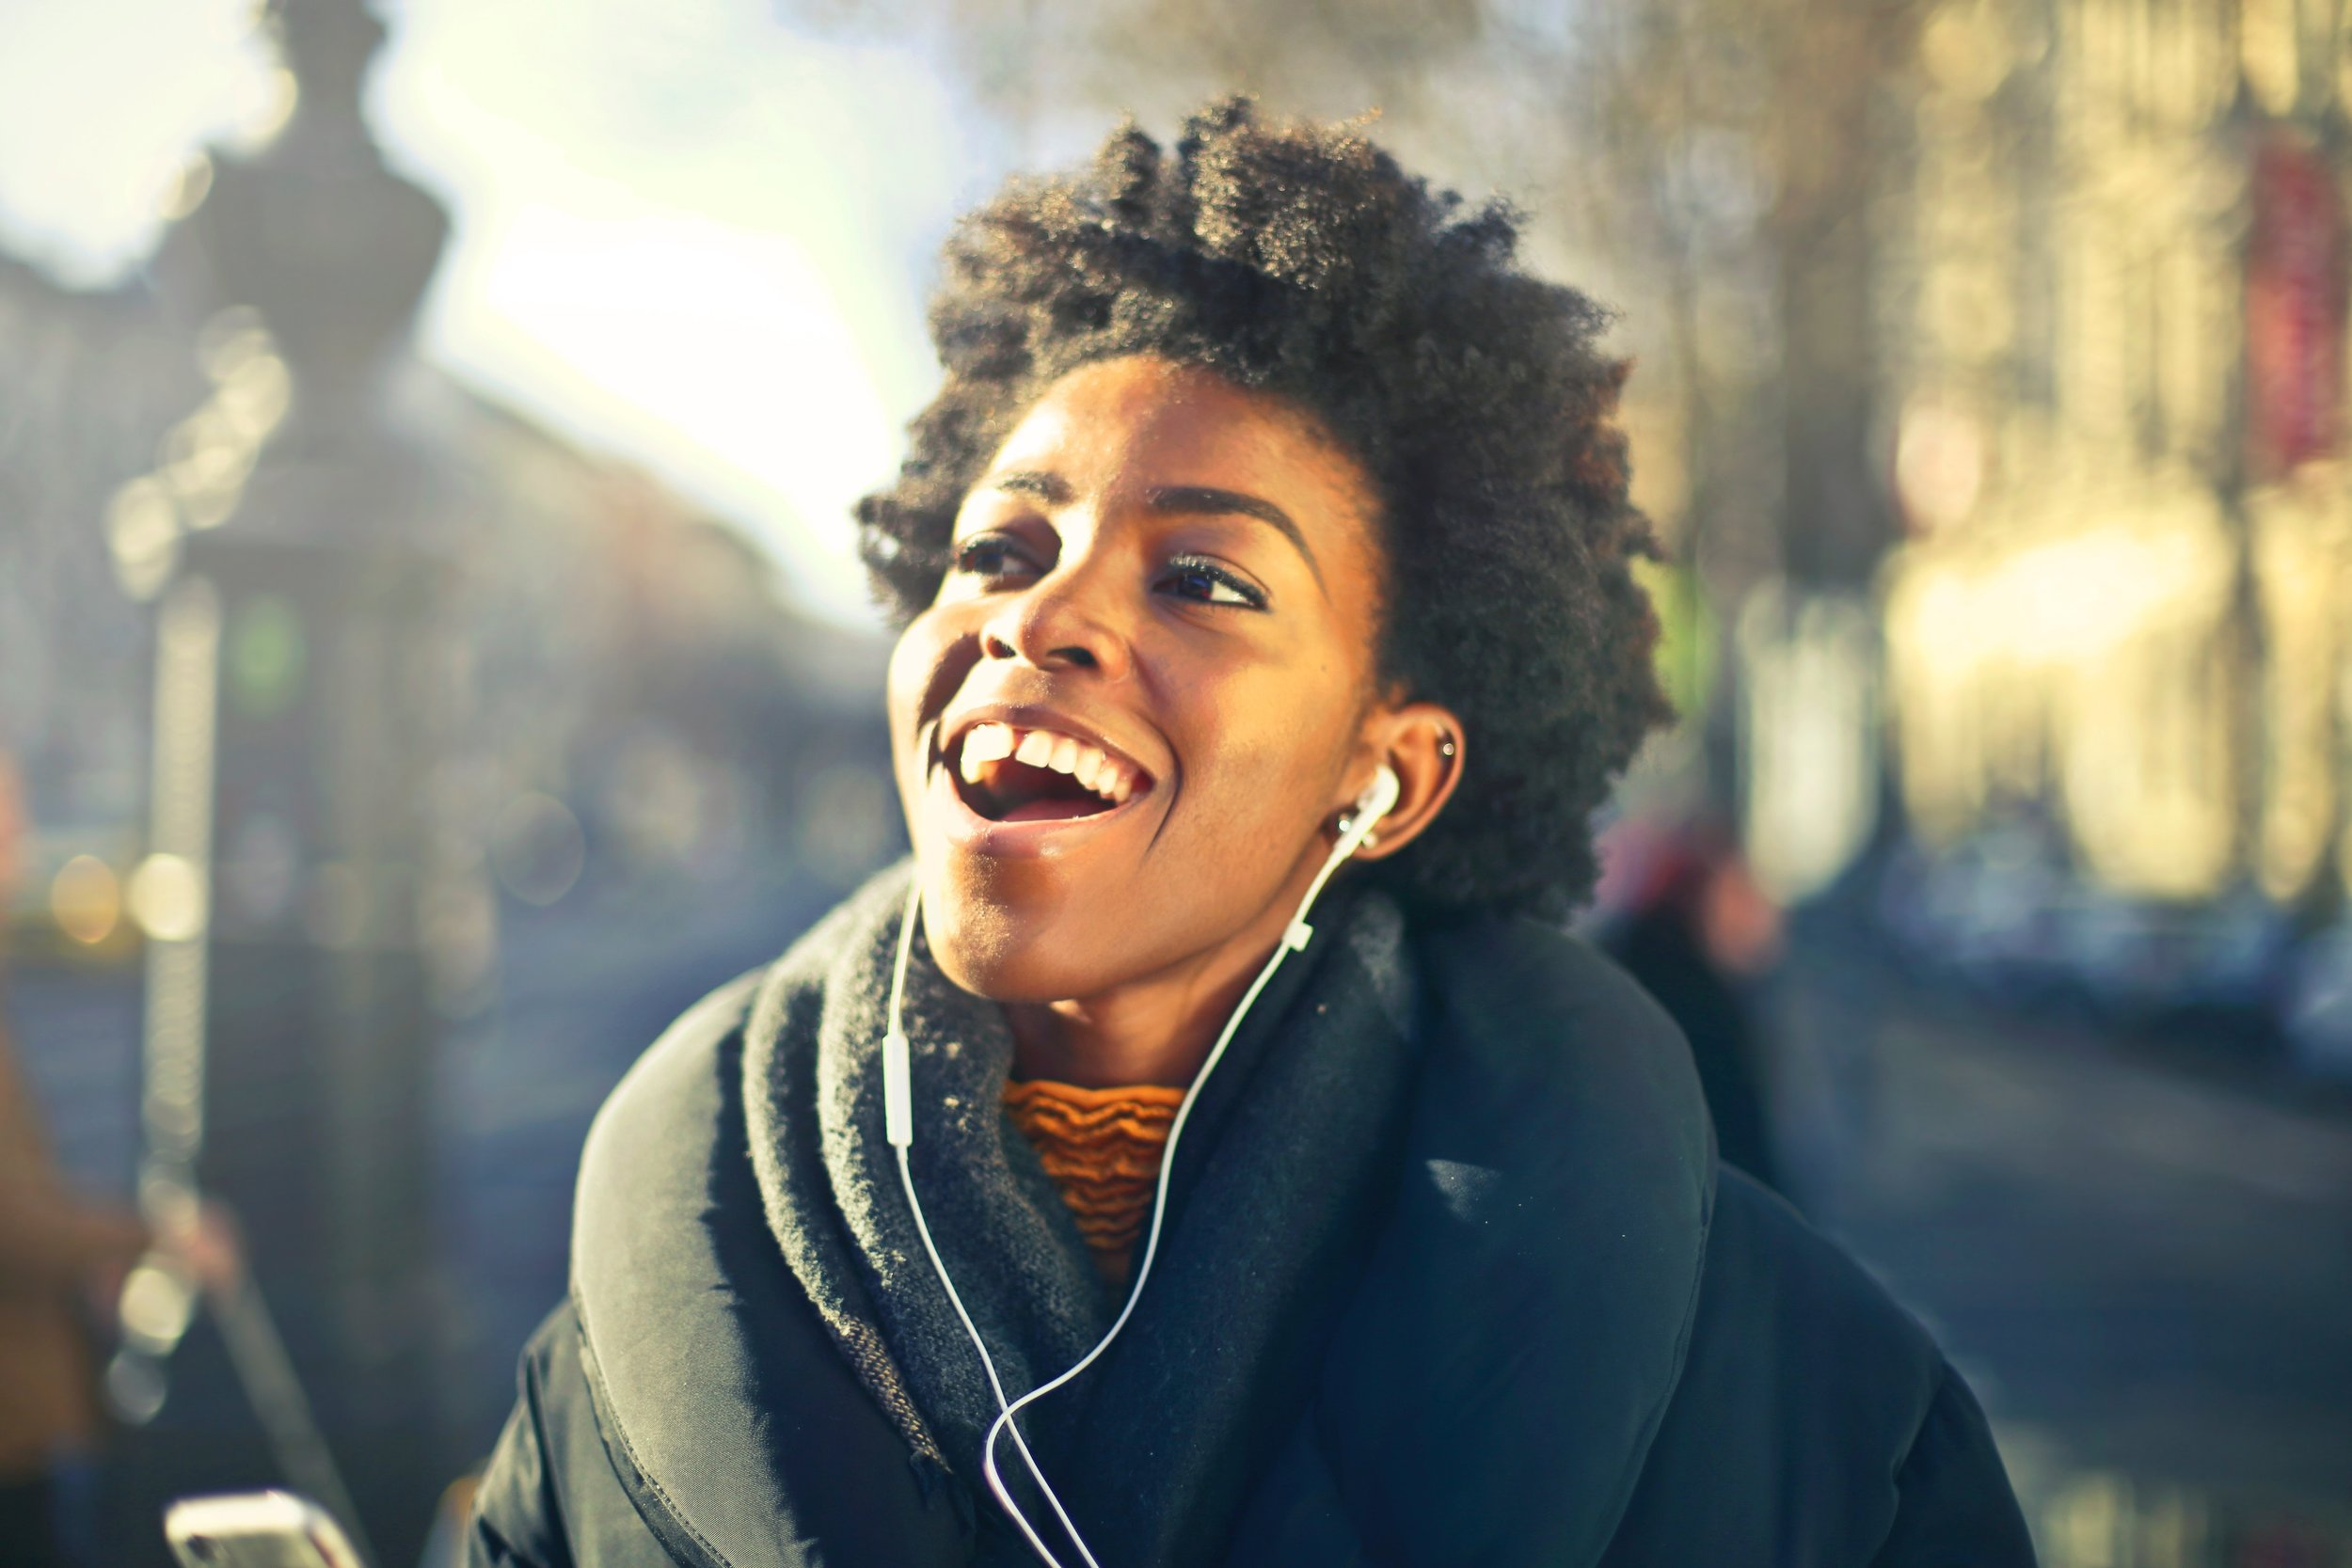 woman-smiling-listening.jpg